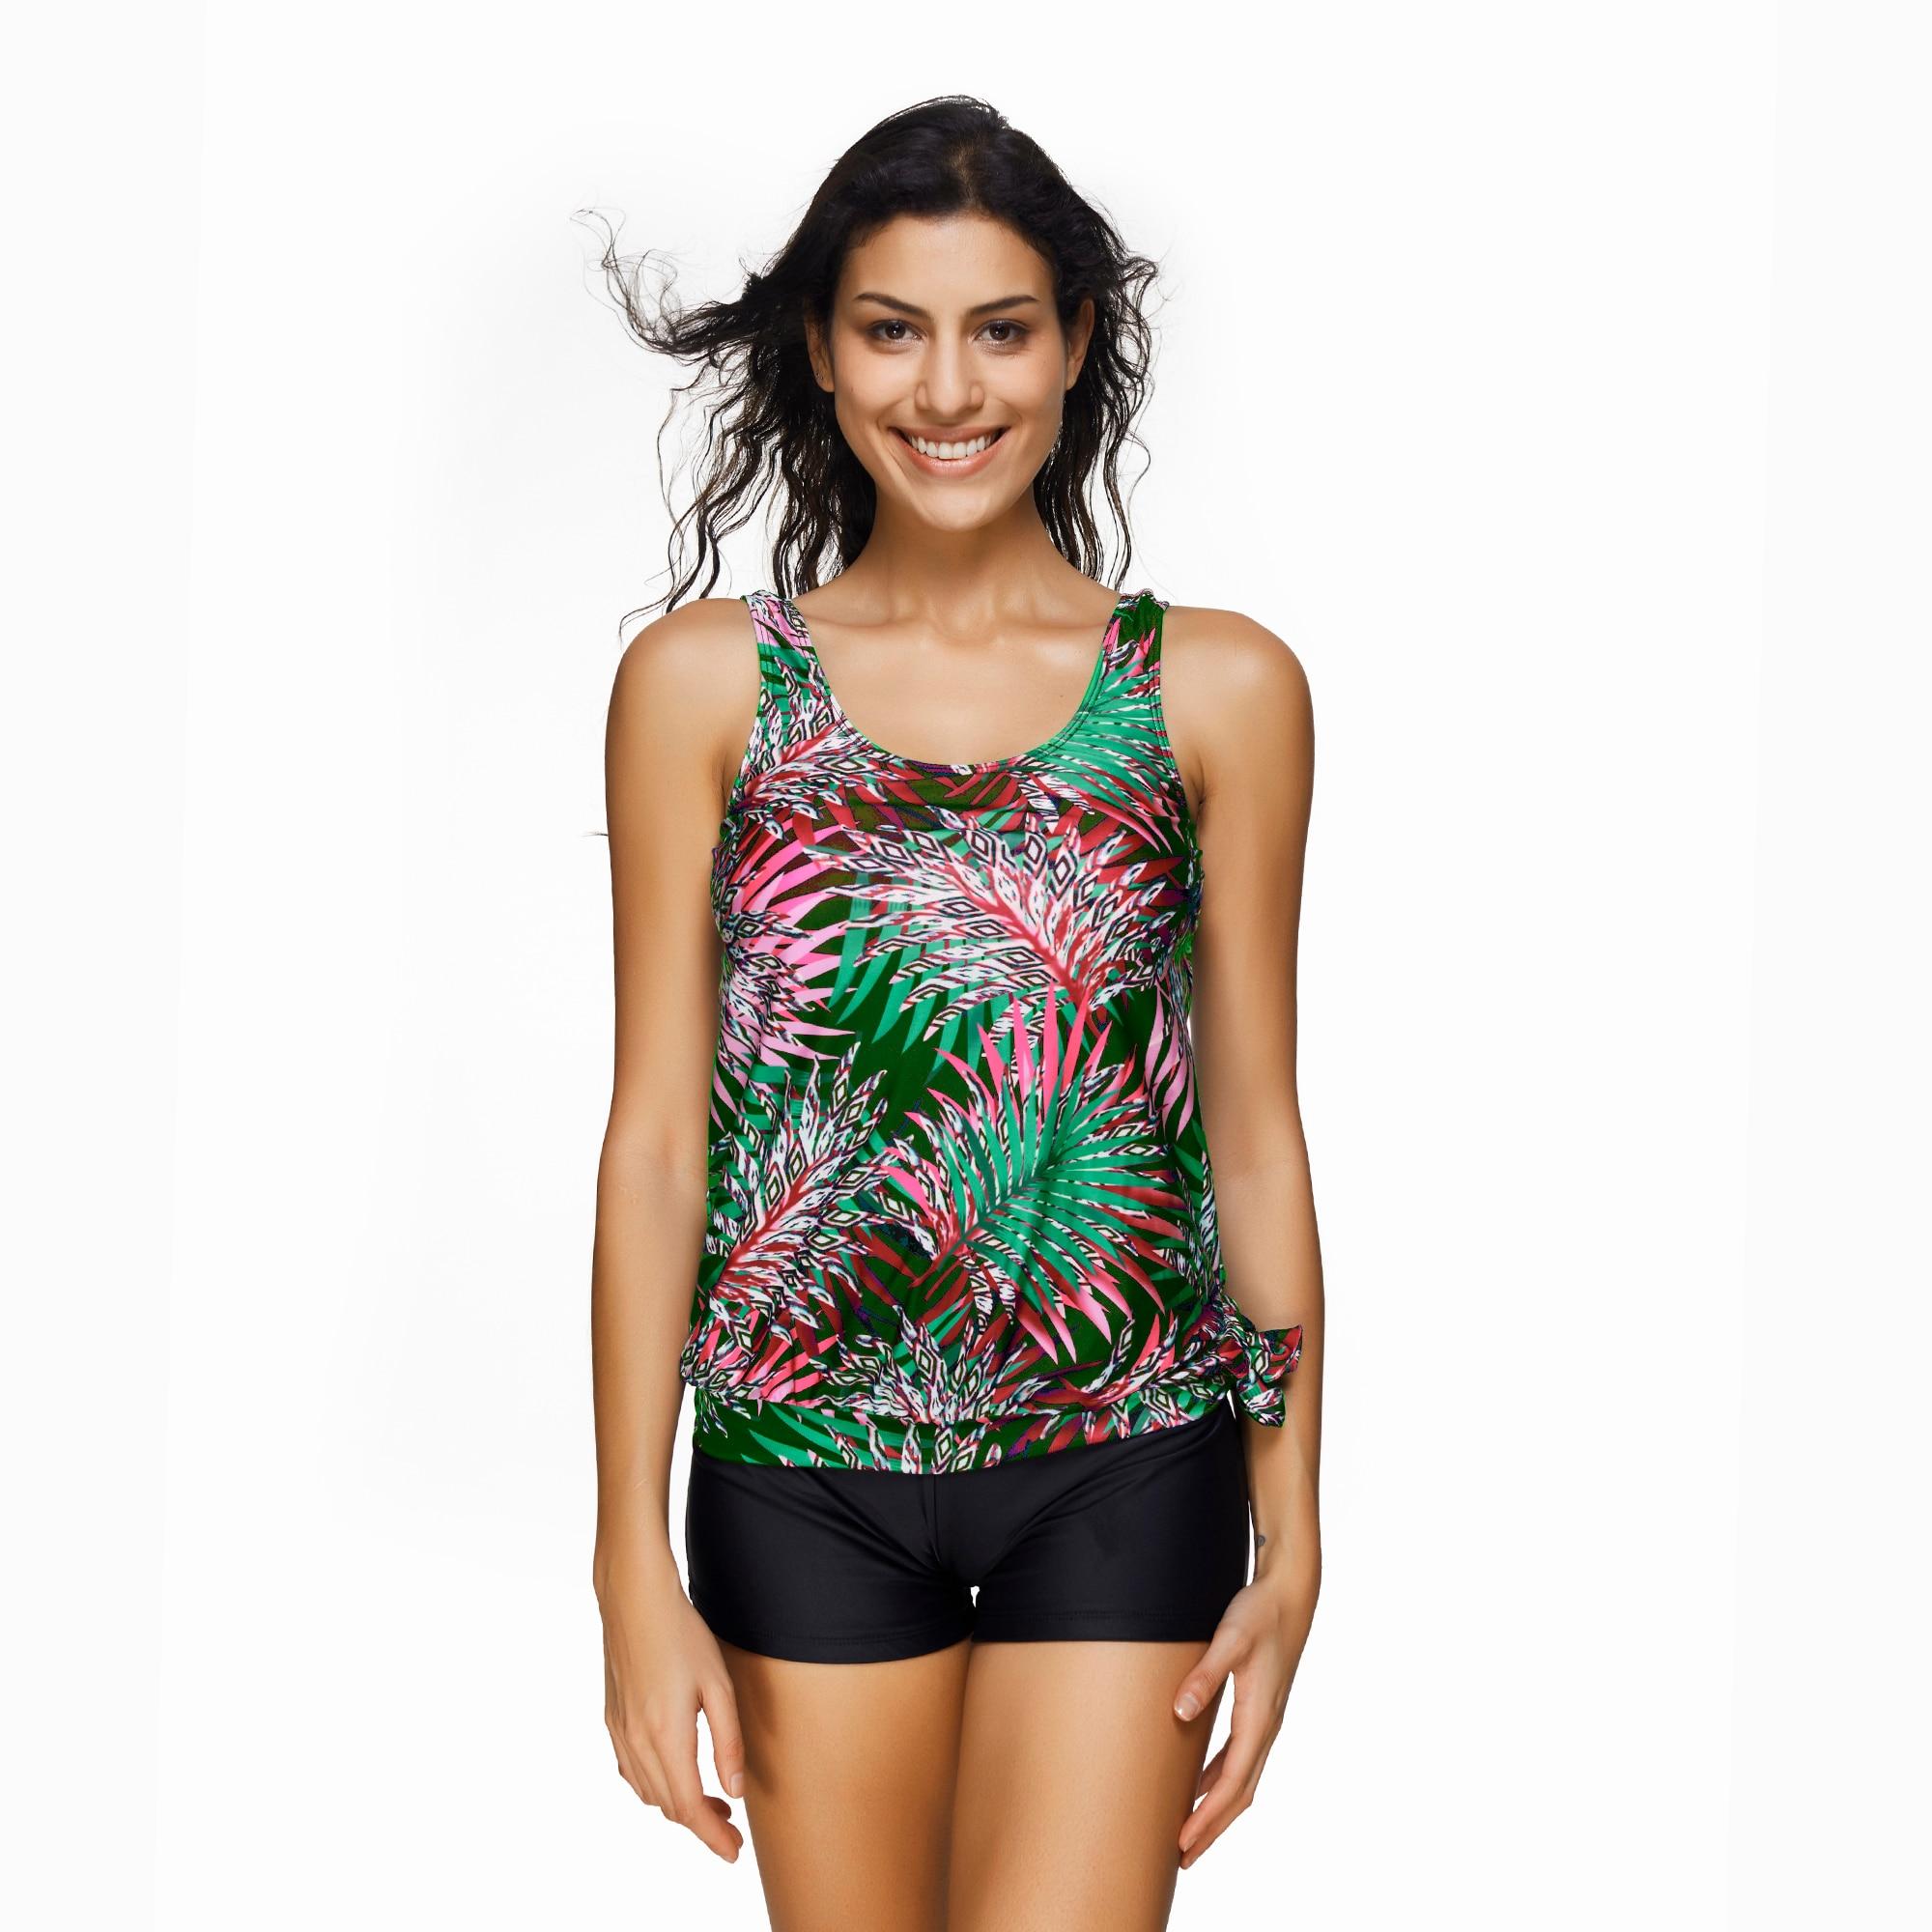 TCBSG Sports Vest Swimsuit Women Swimwear Print Swim Trunks Swimming Bodysuit Cover Up Pool Bather Hot Sale Bikini Bathing Suit